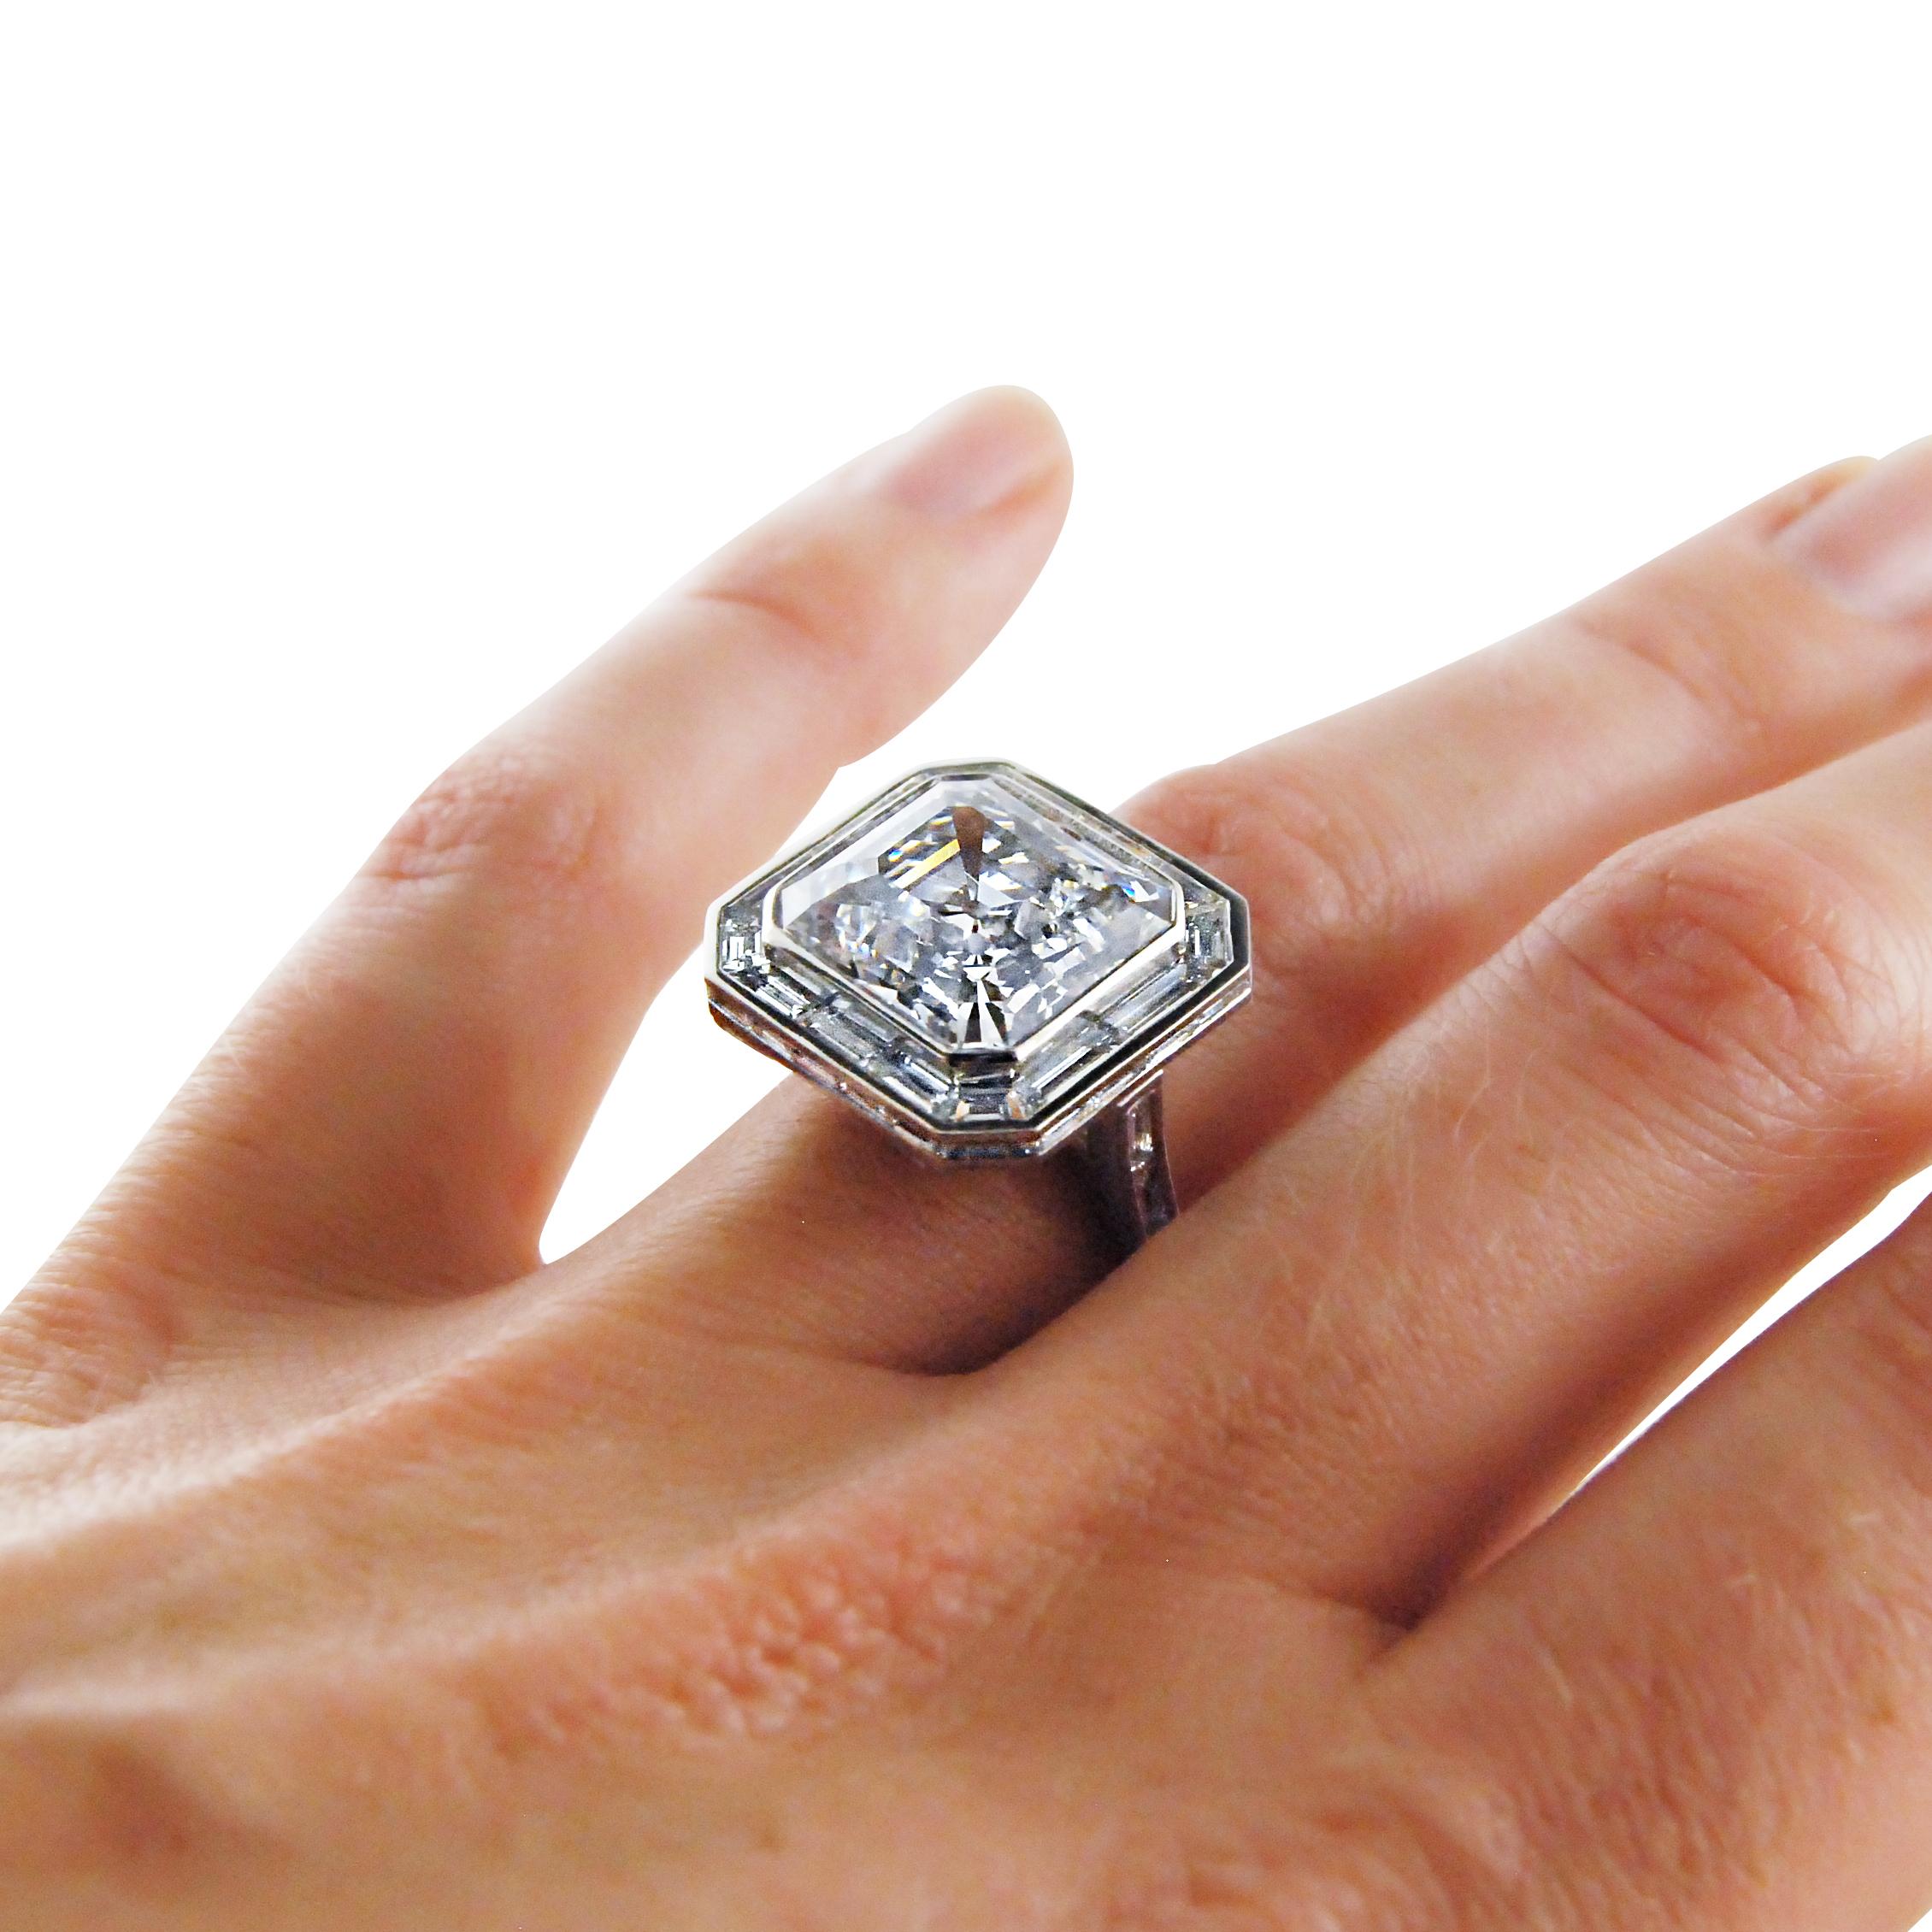 10.62ct-step-cut-diamond-and-platinum-ring-2.jpg